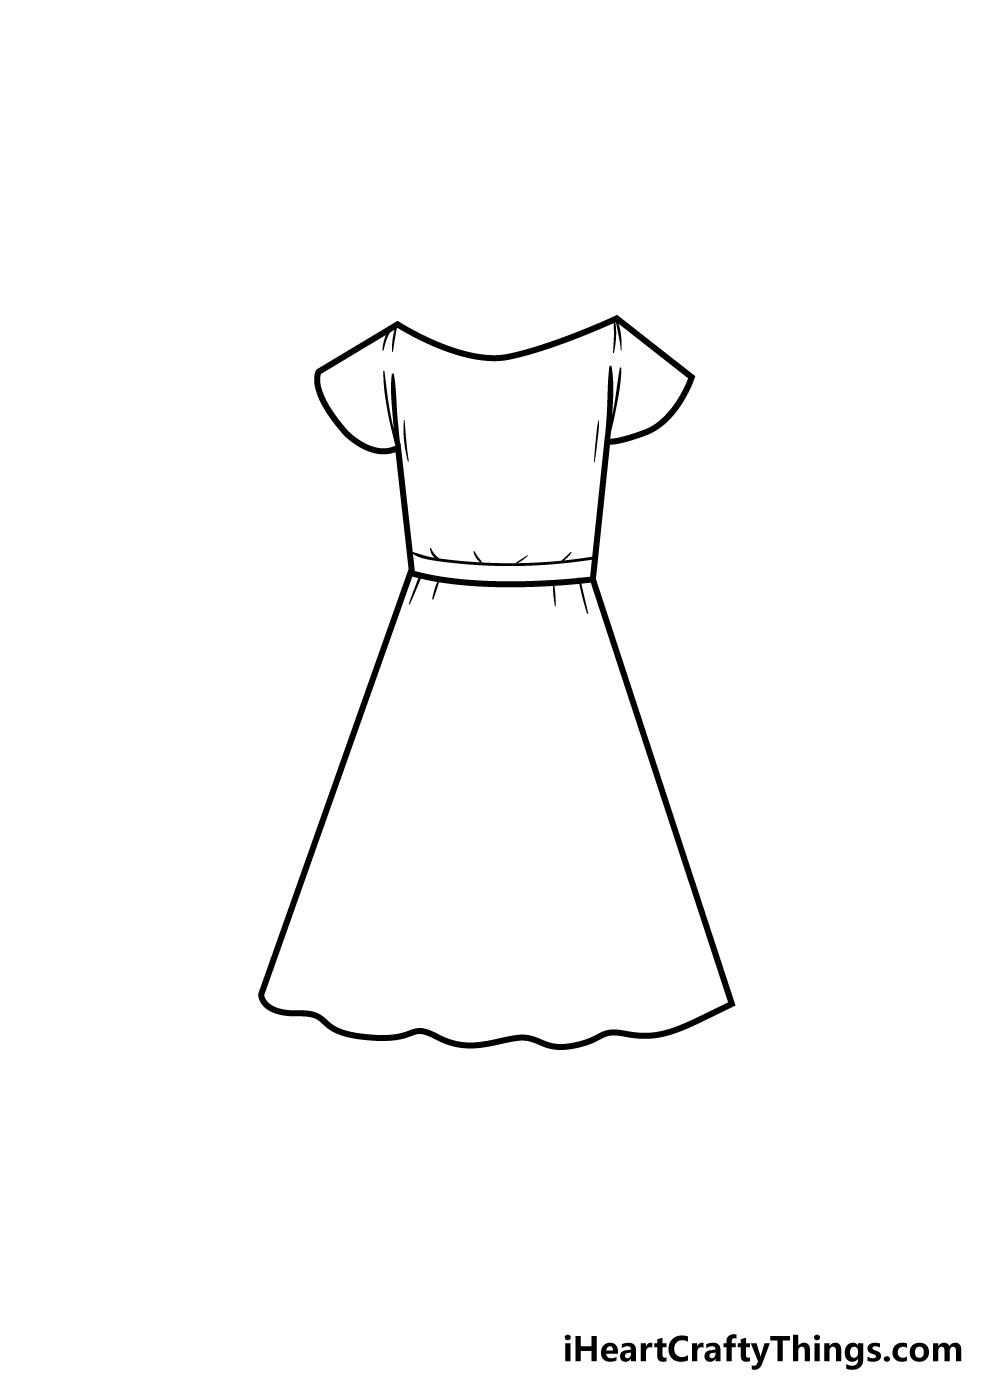 dress drawing step 5